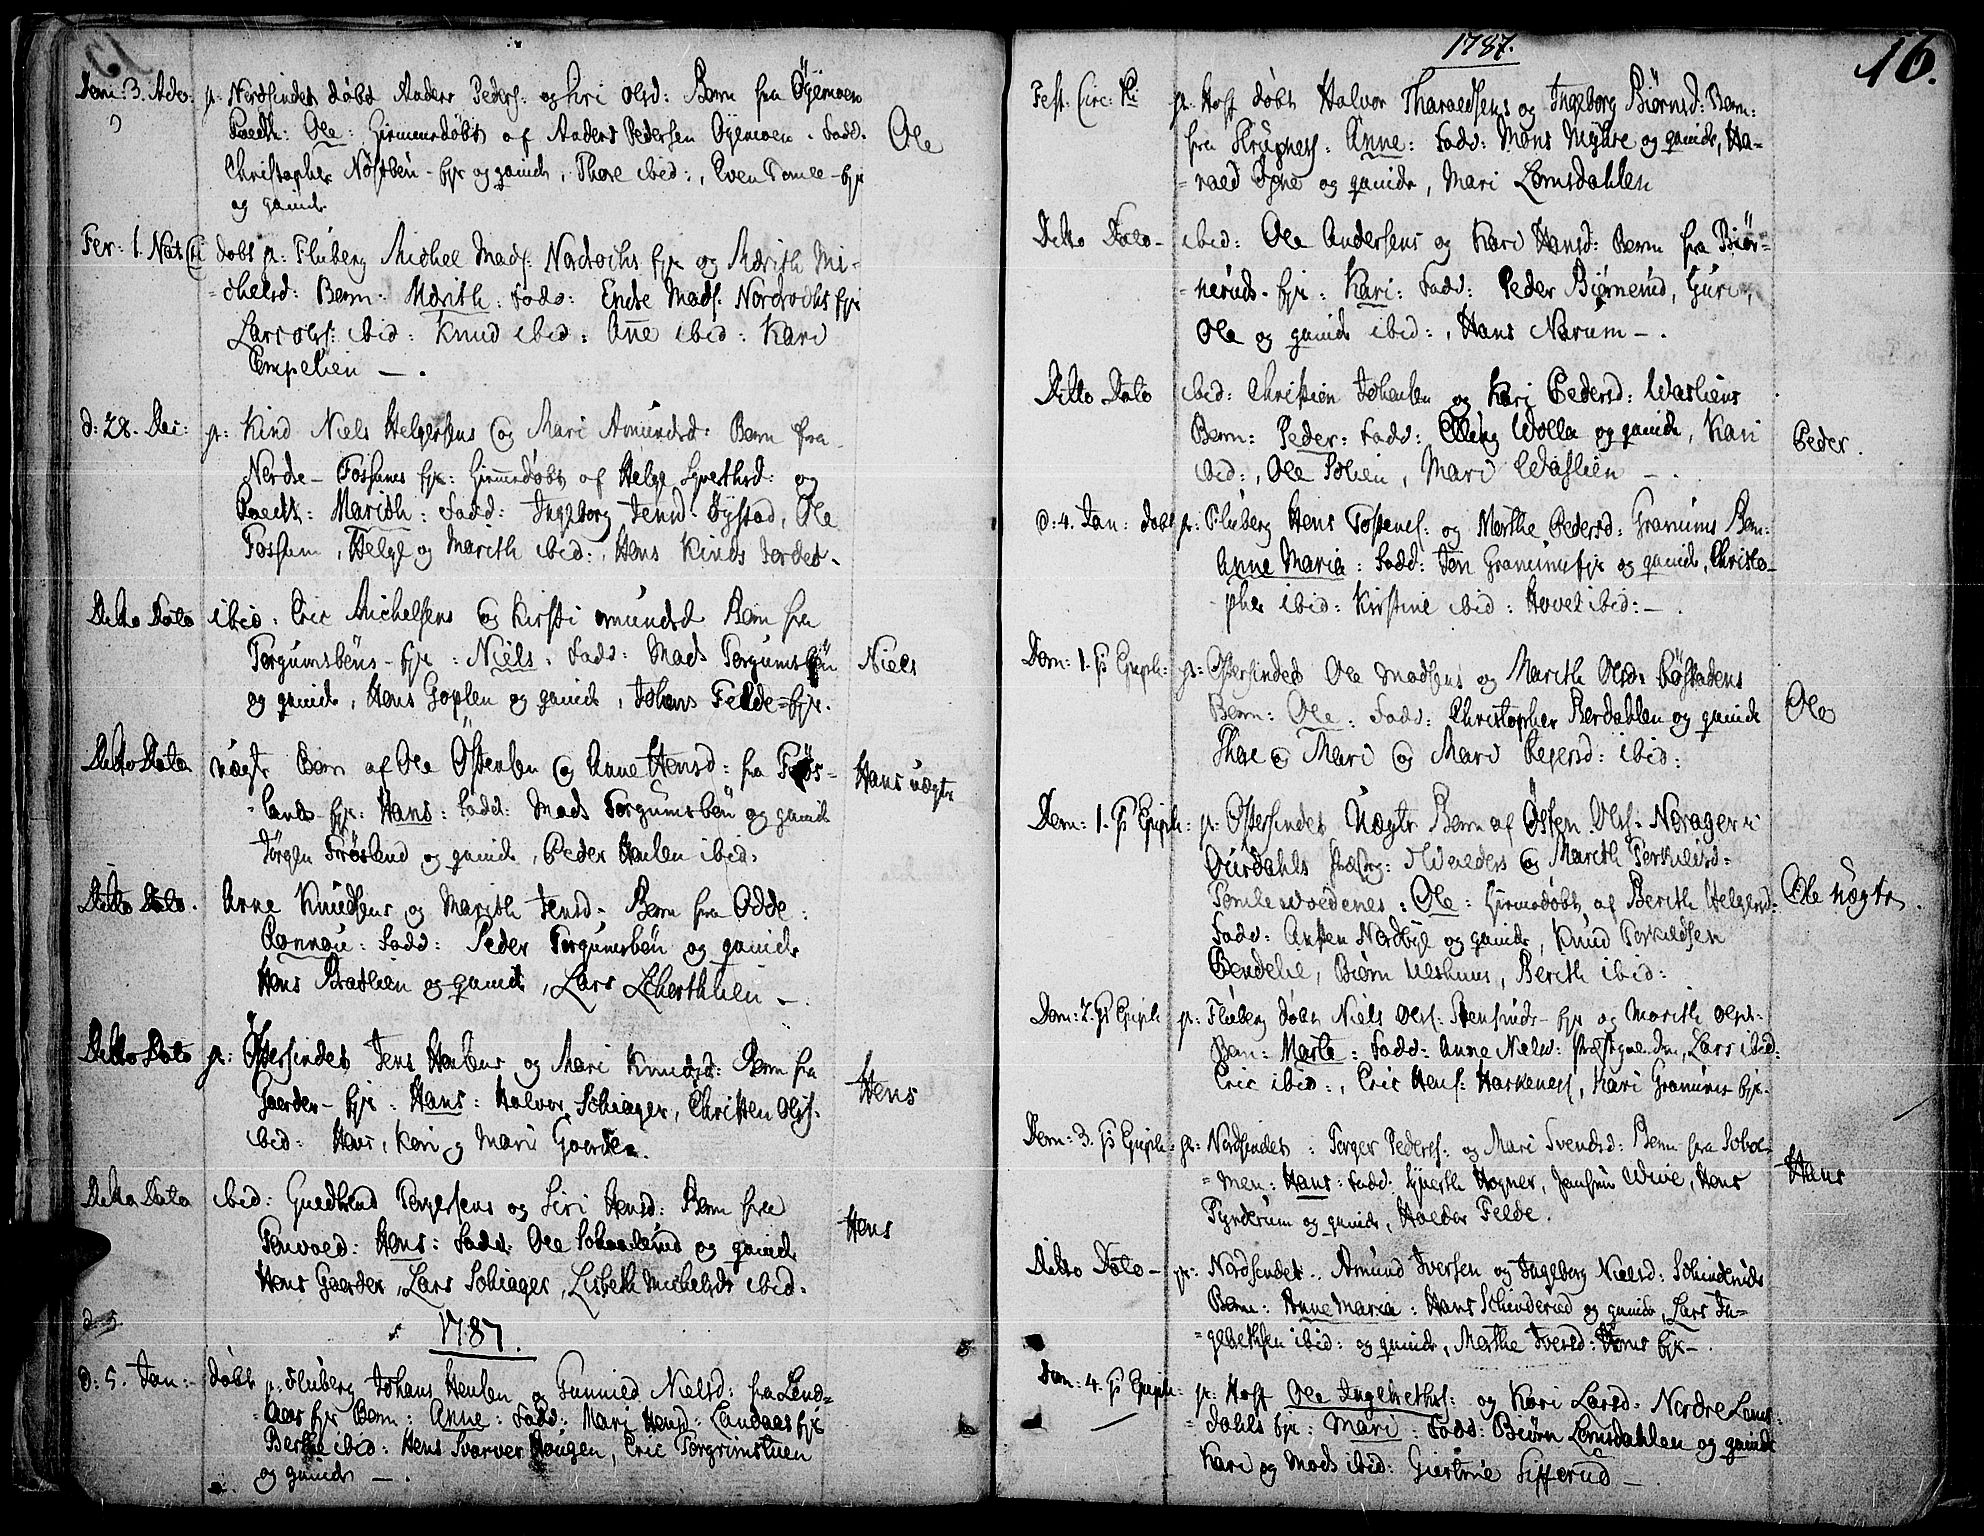 SAH, Land prestekontor, Ministerialbok nr. 6, 1784-1813, s. 16